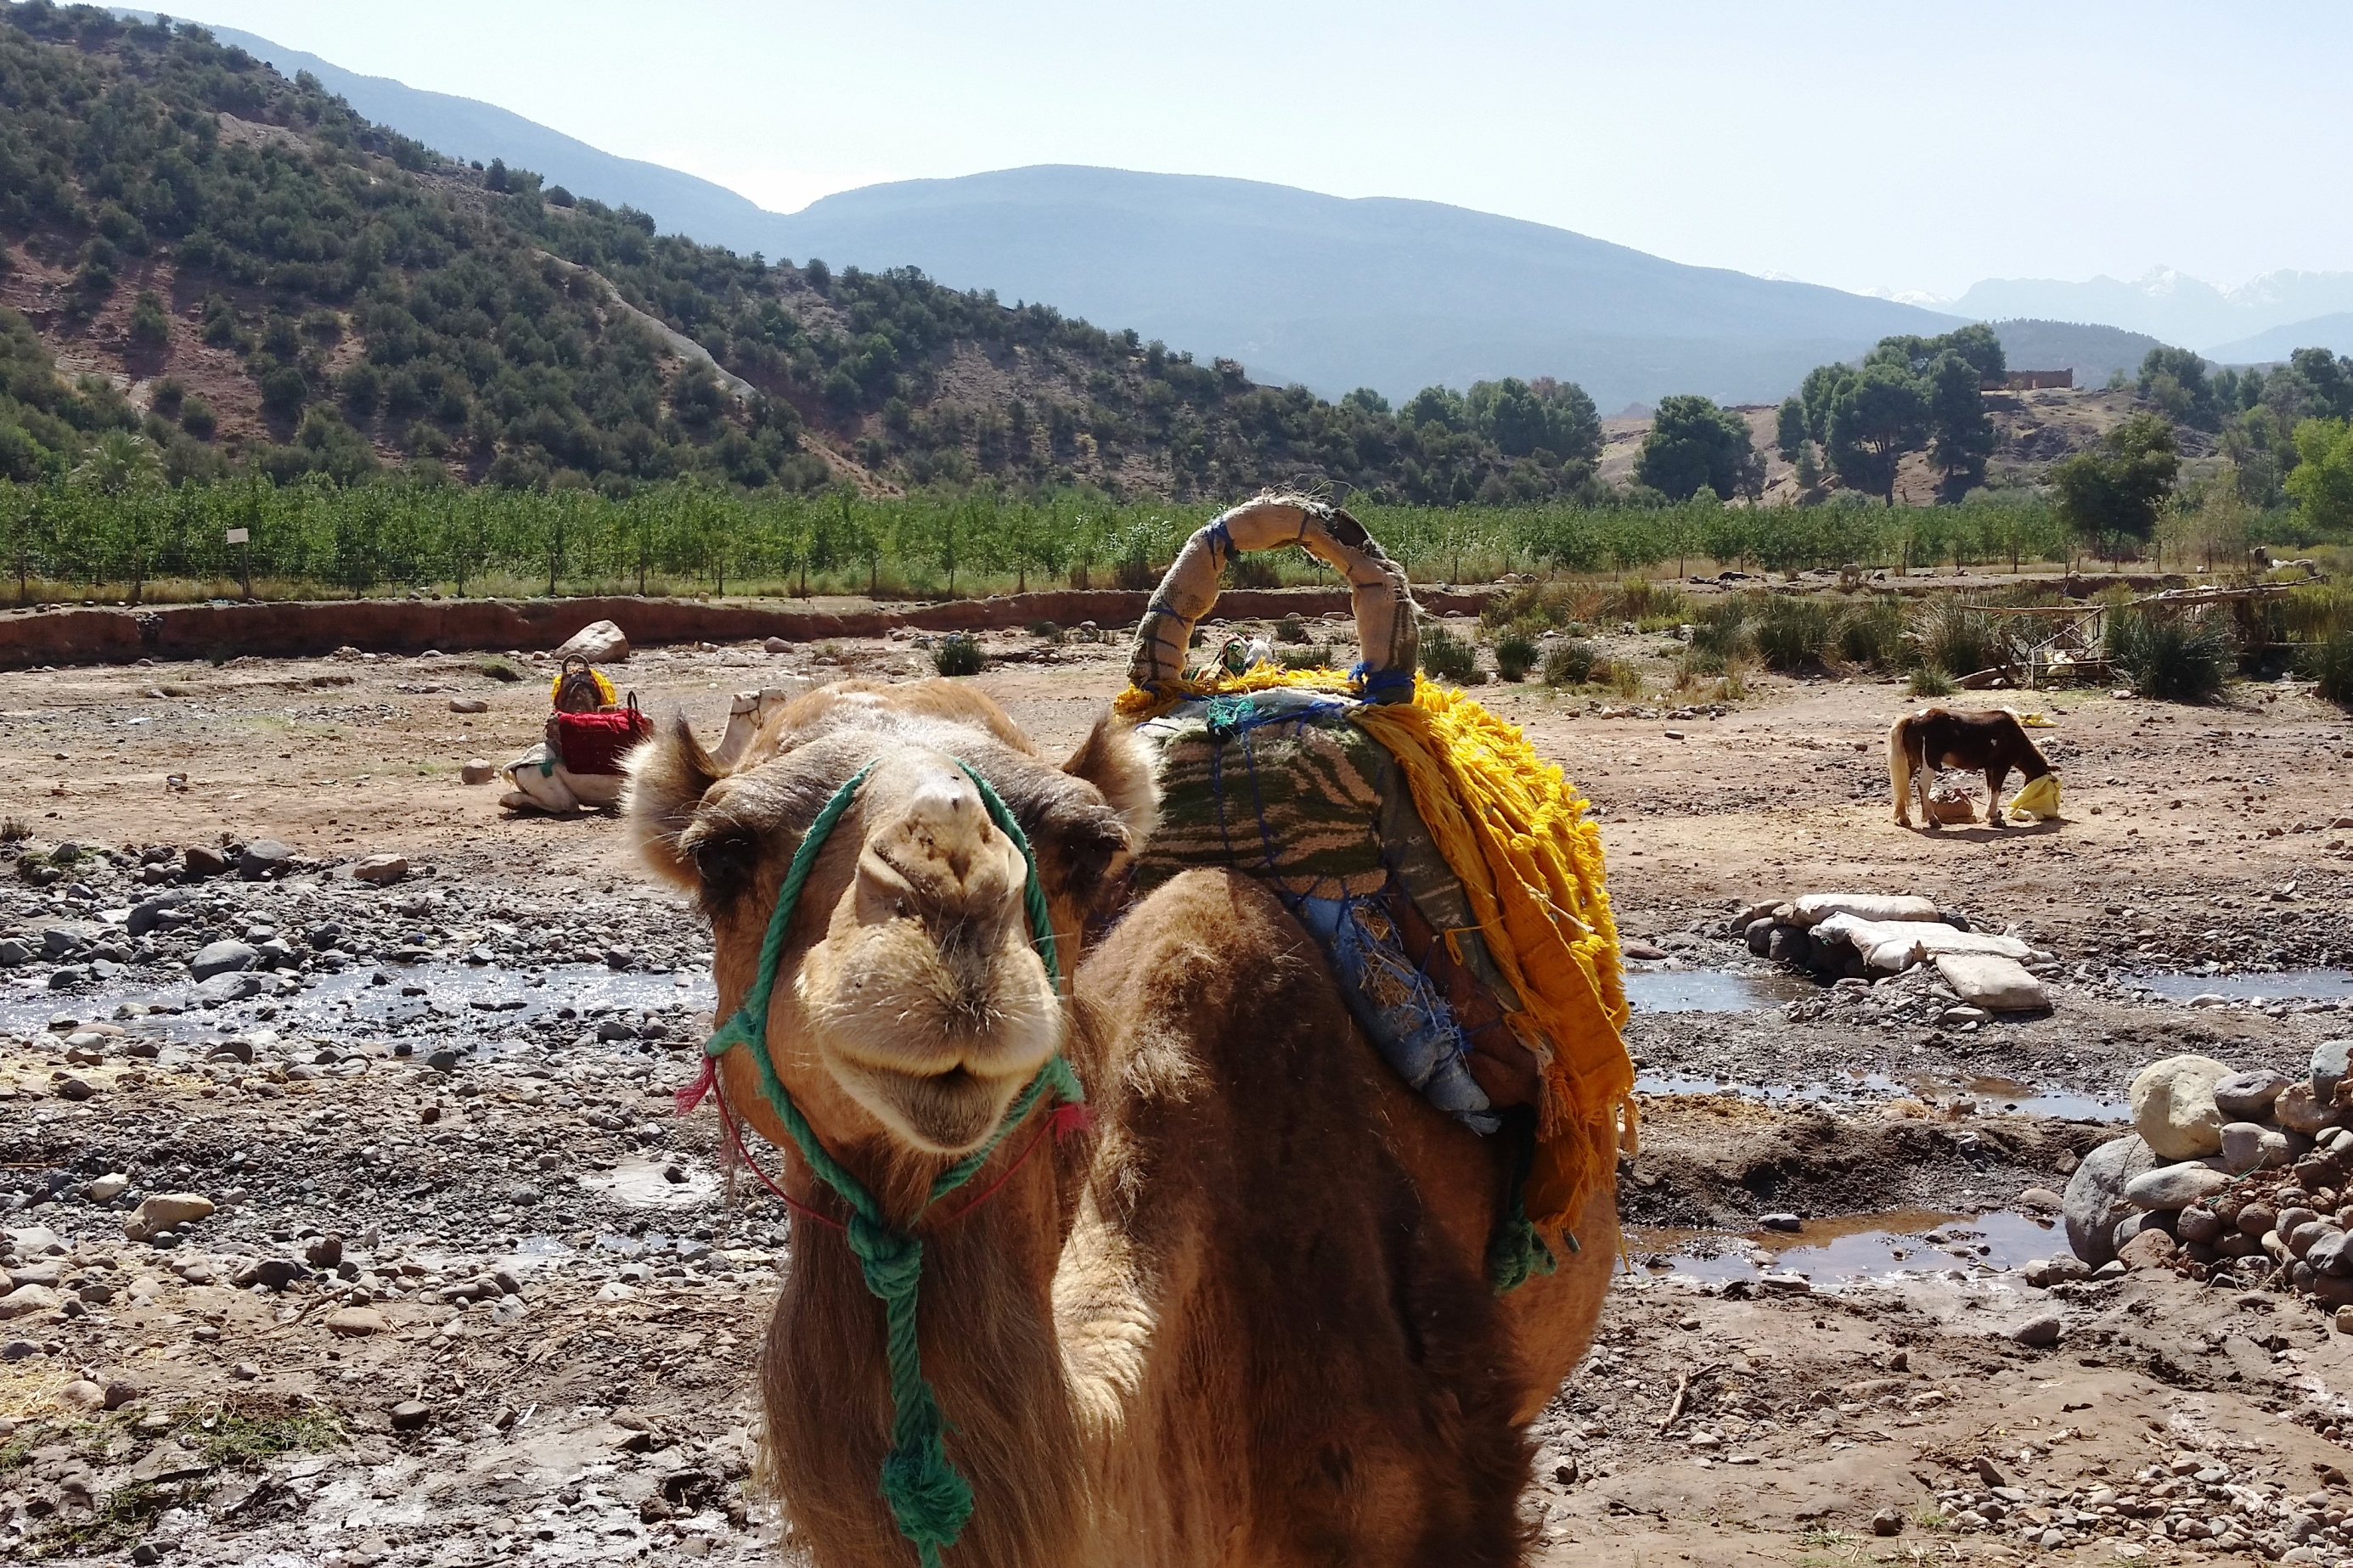 Camel riding is popular